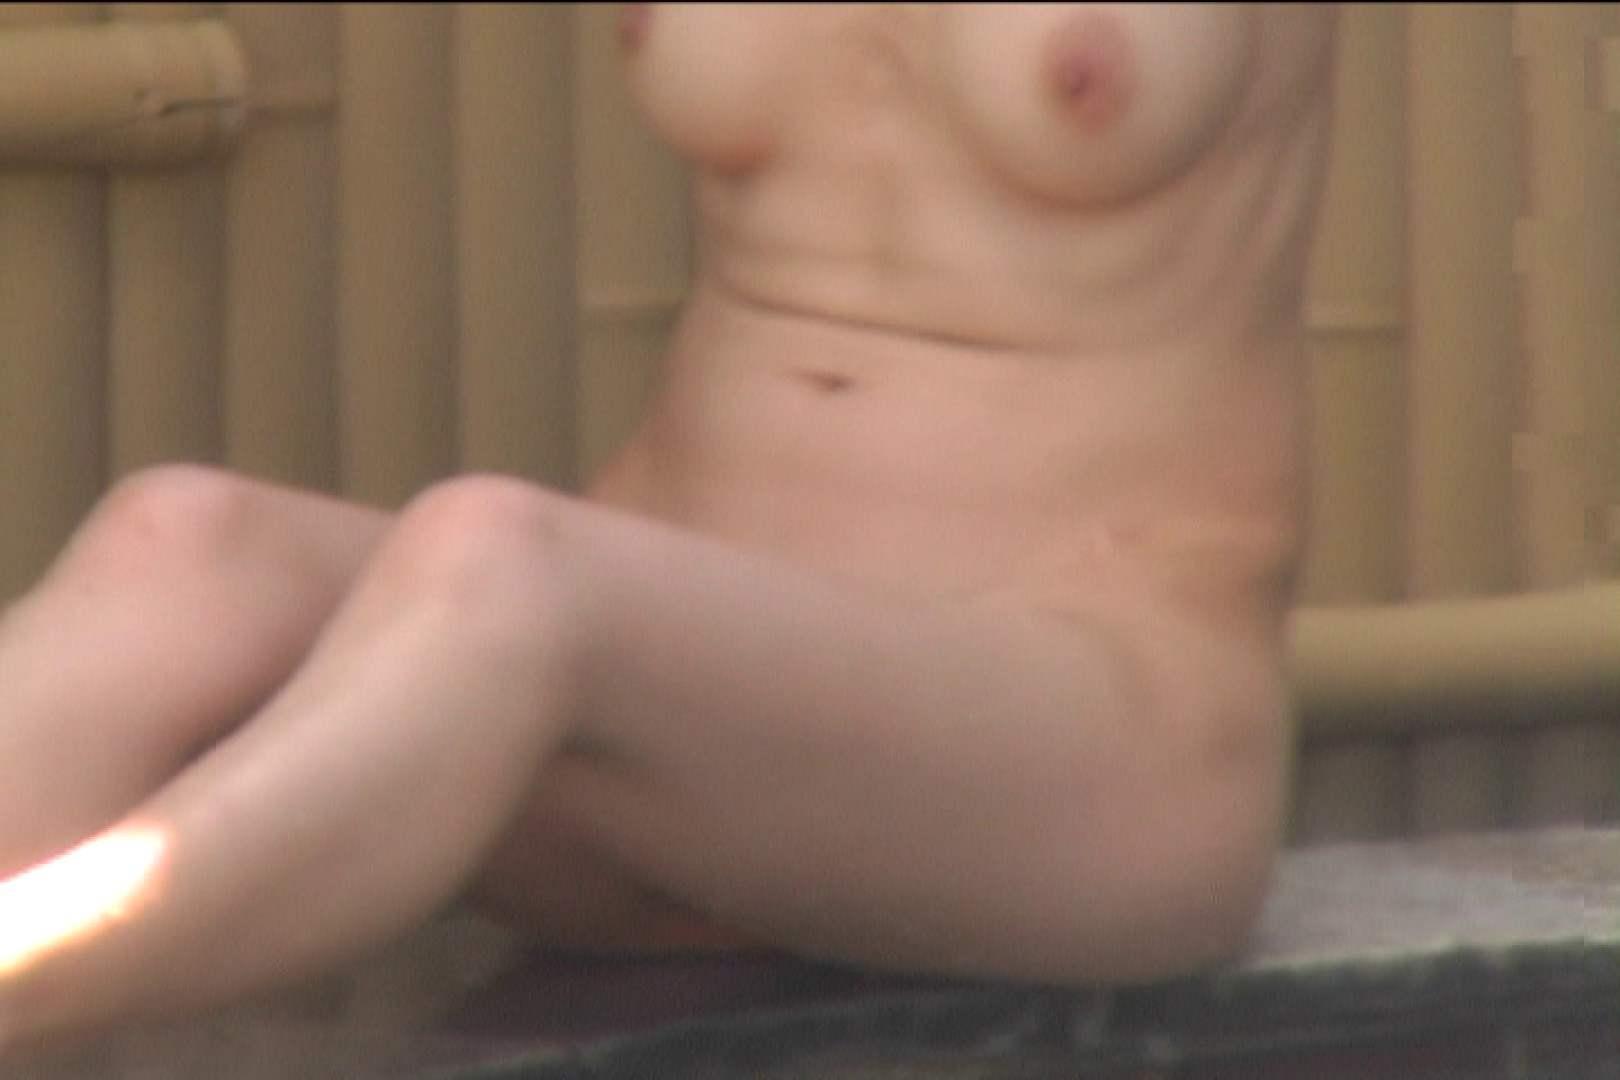 Aquaな露天風呂Vol.526 0 | 0  73連発 43